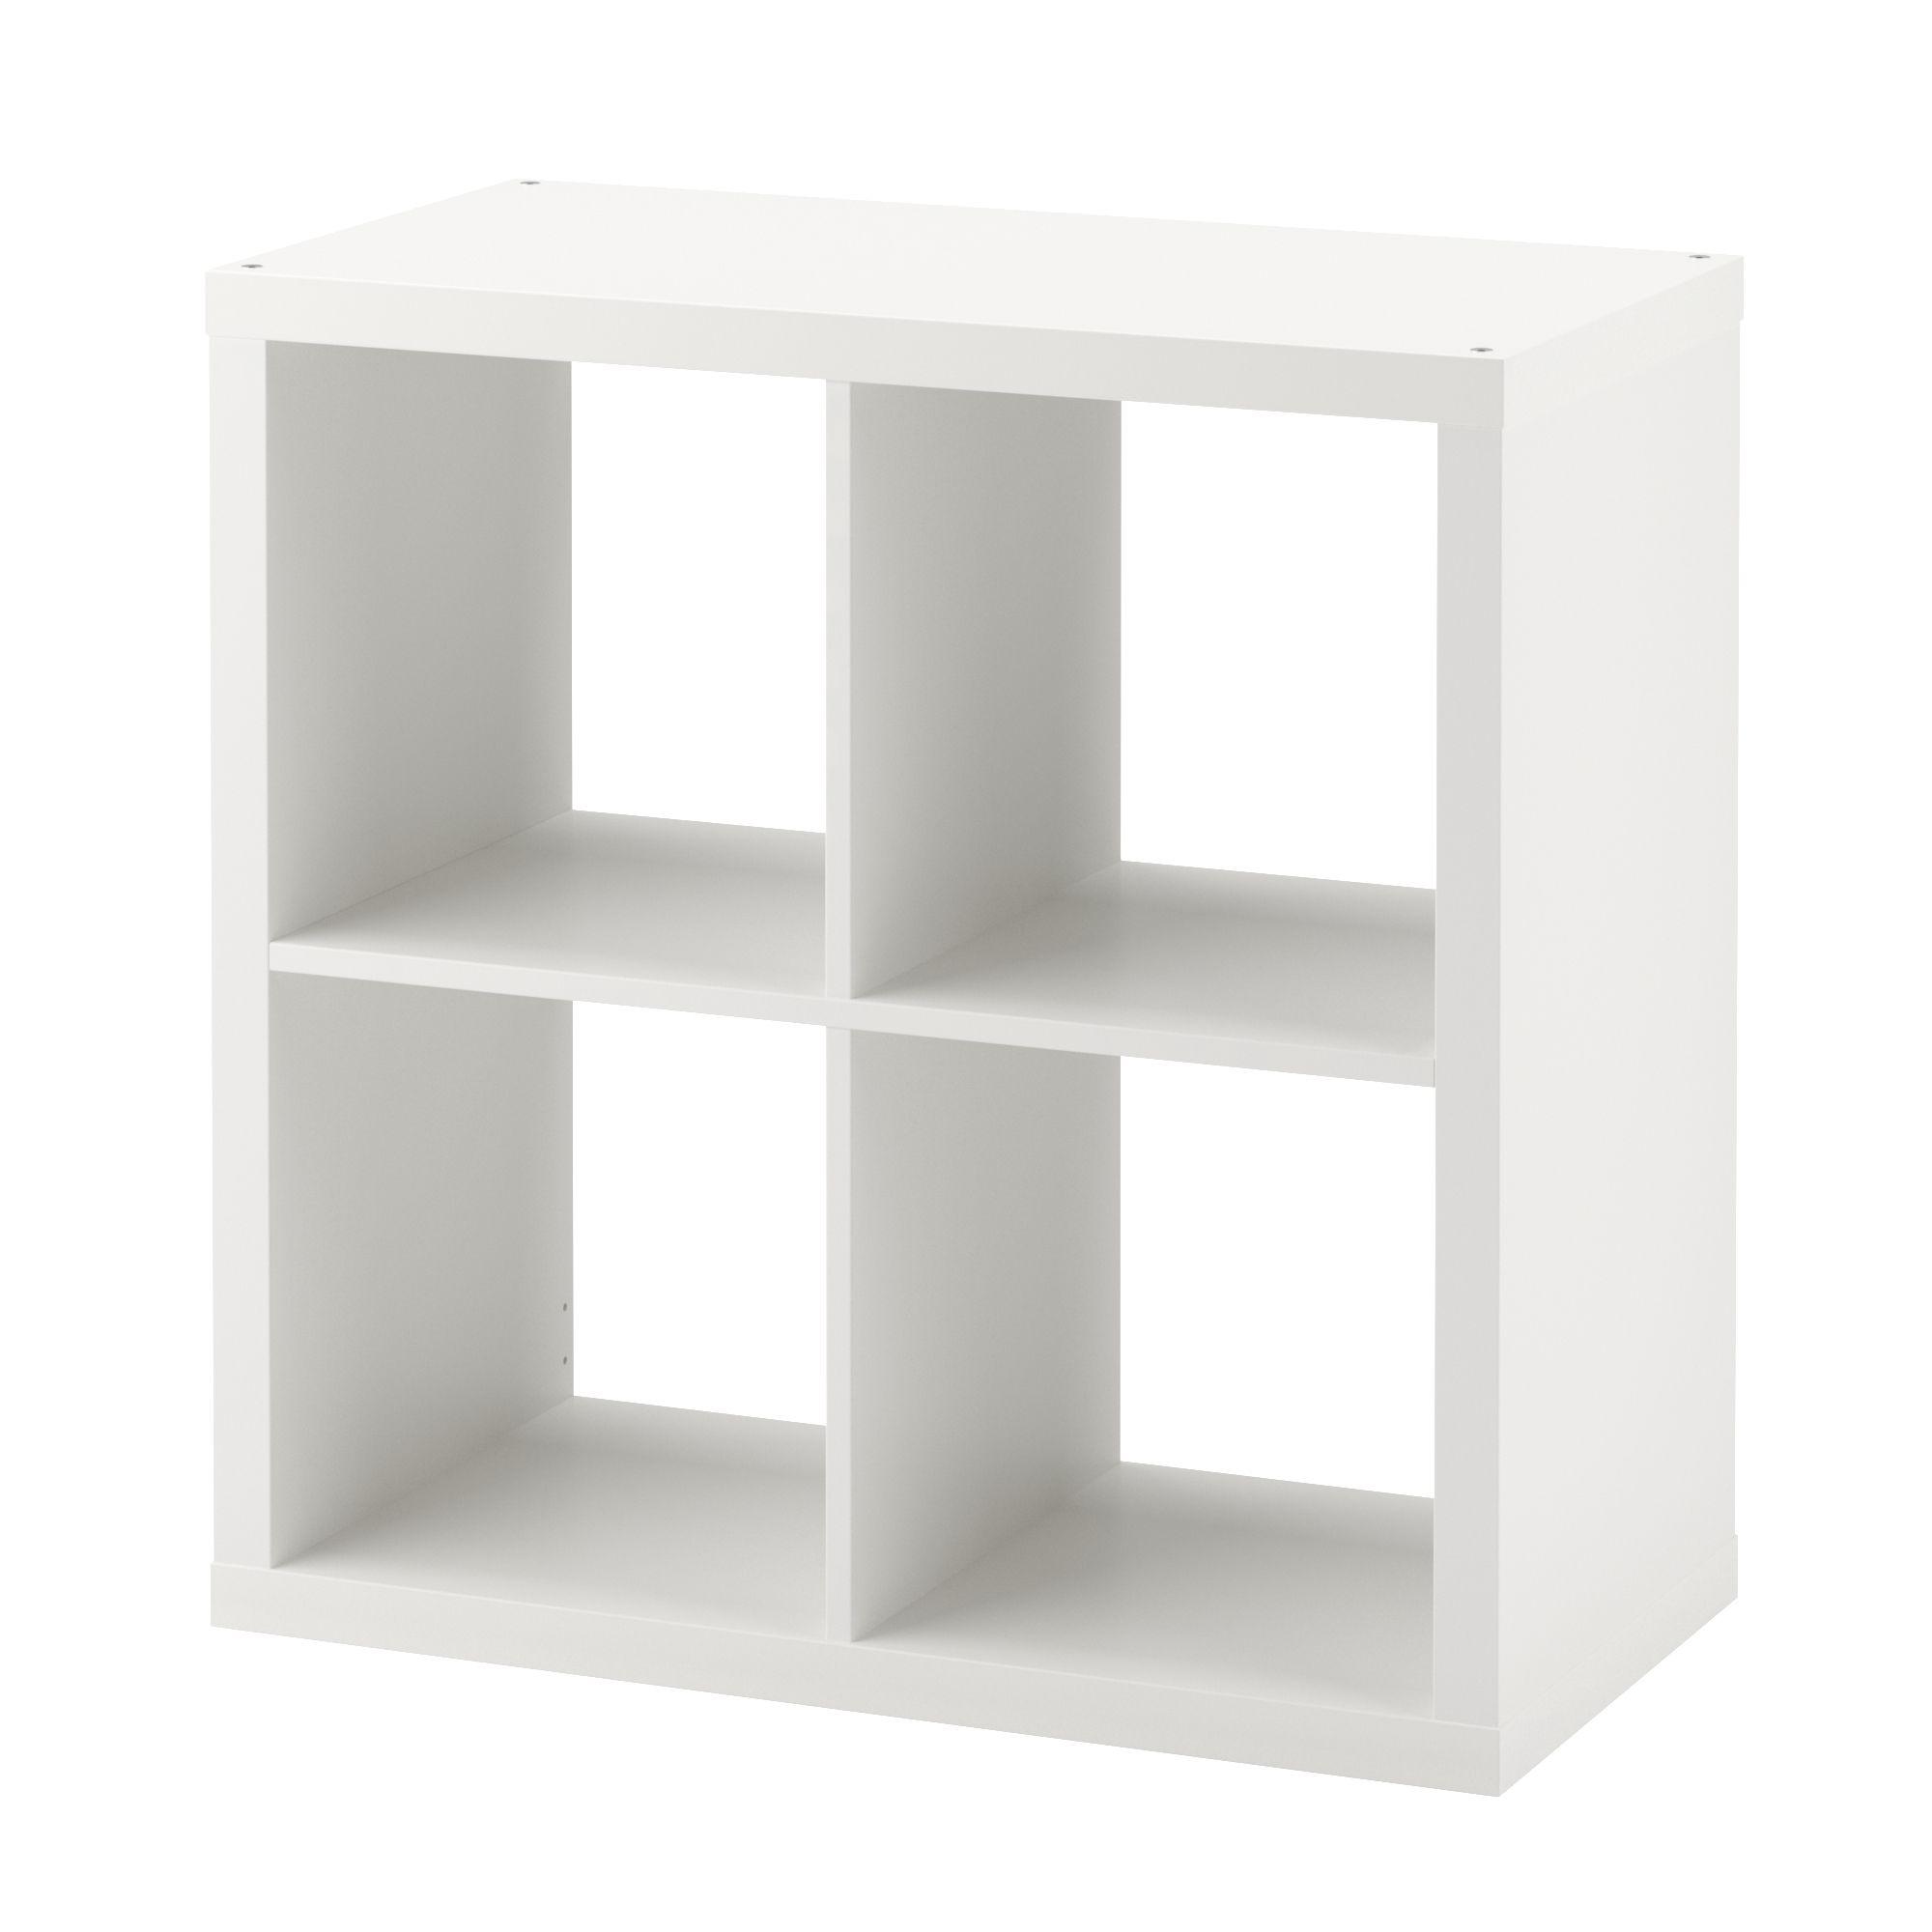 Kallax Shelf Unit White Ikea Ikea Kallax Shelving Kallax